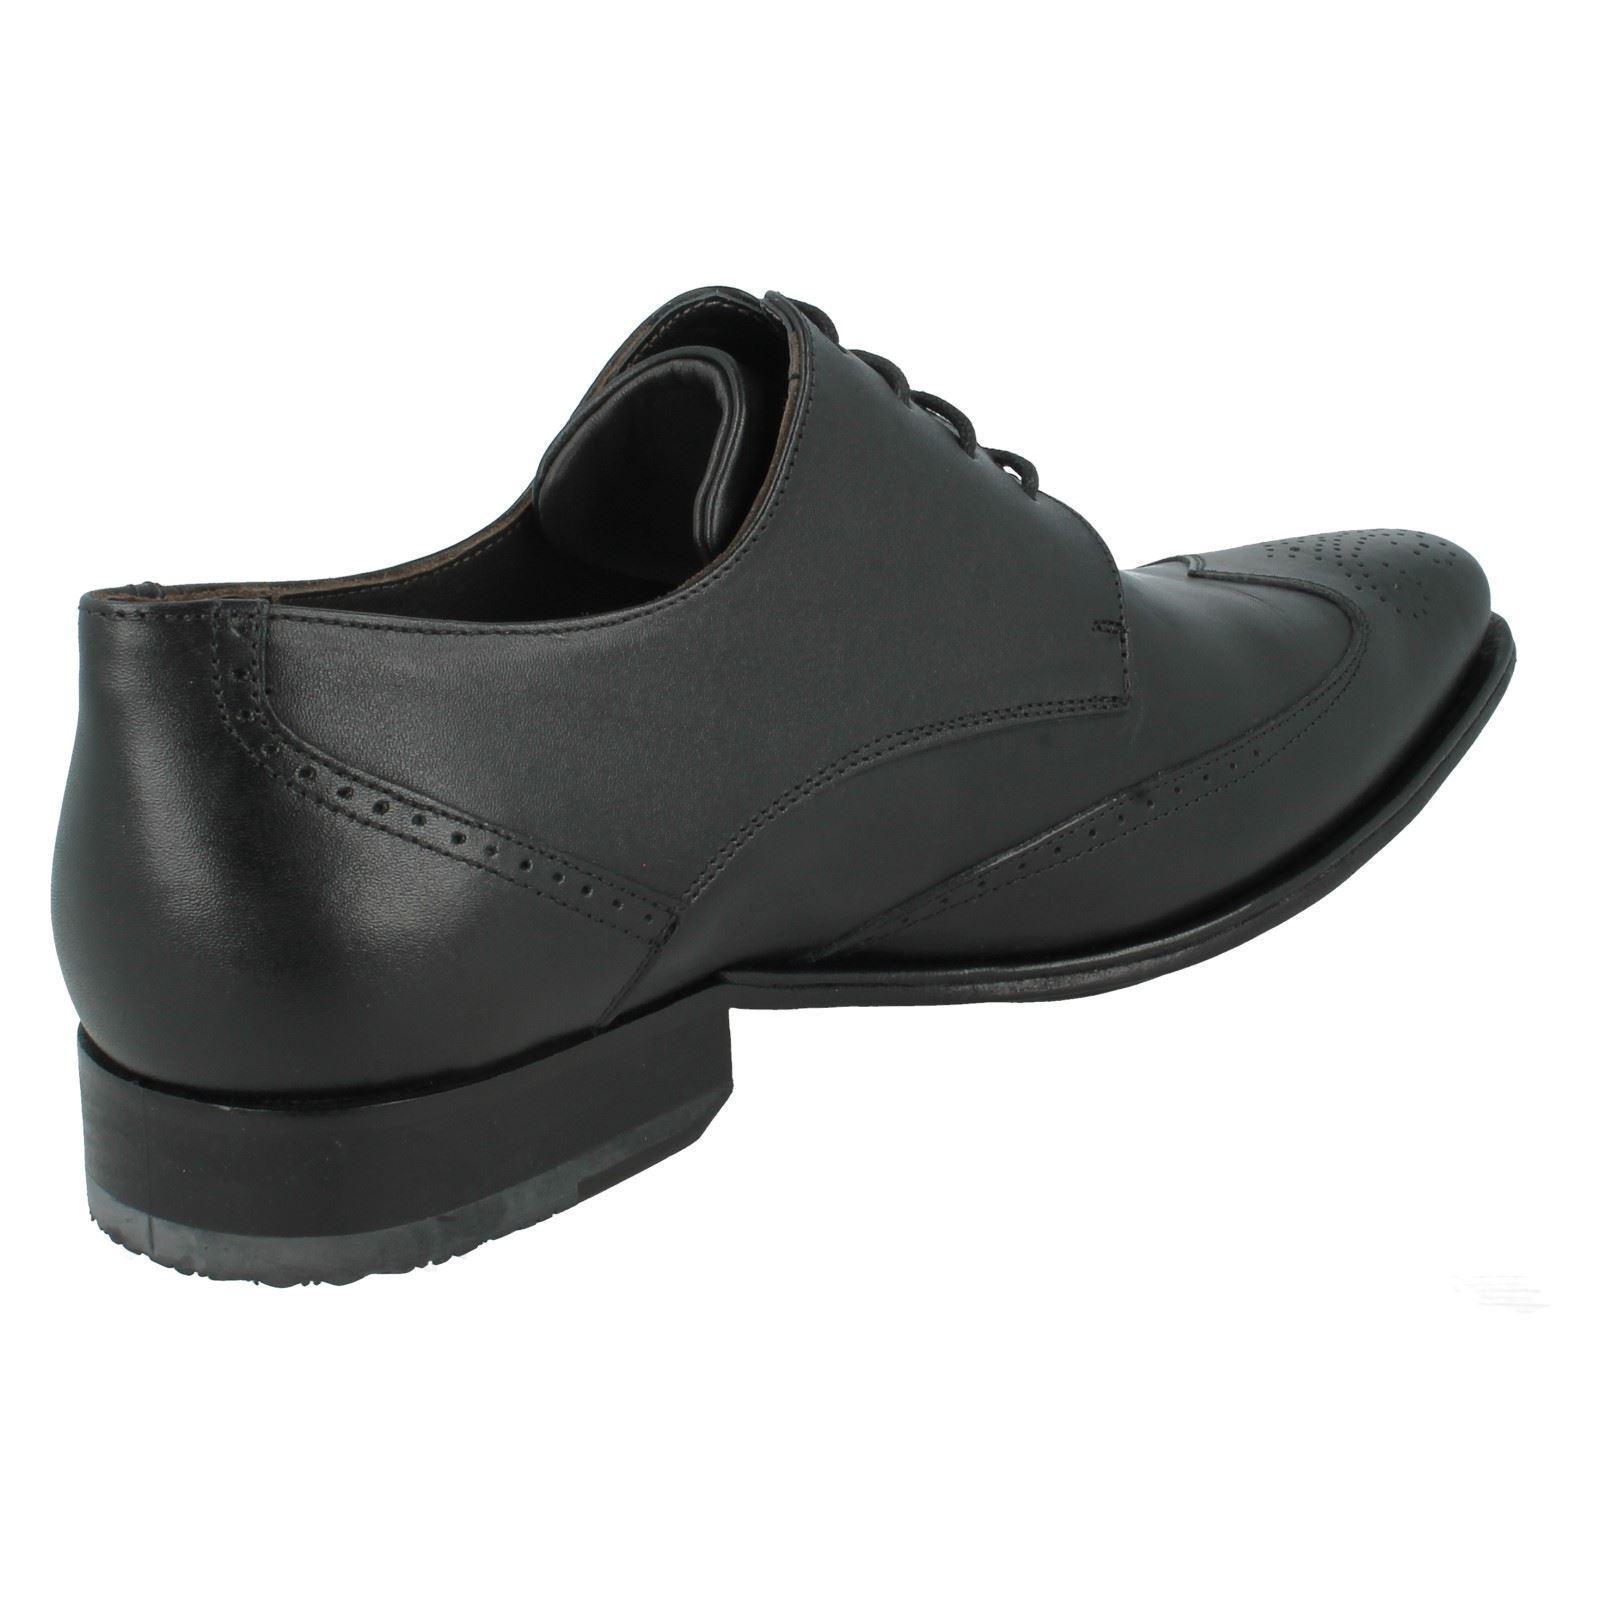 Up Uomo Guara Leder Lace Up  Schuhe By Anatomic abf4a2